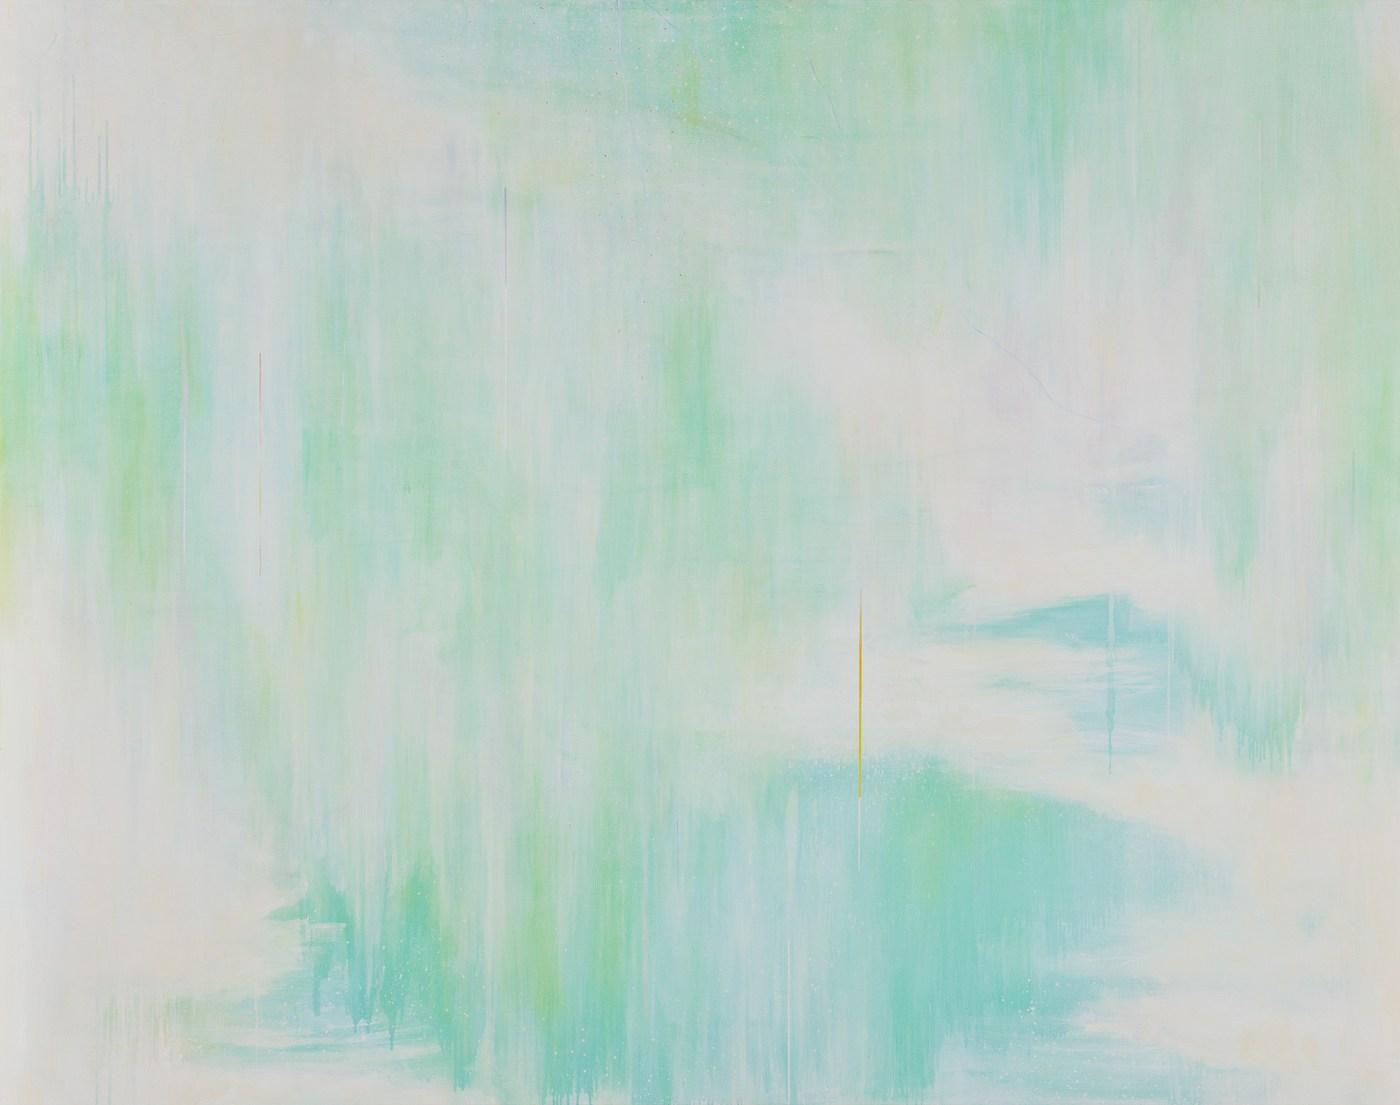 02_紀嘉華 Jason Chi_寂靜之光 Silent Light_2017_油彩・亞麻布 Oil on Linen_150 x 190 cm